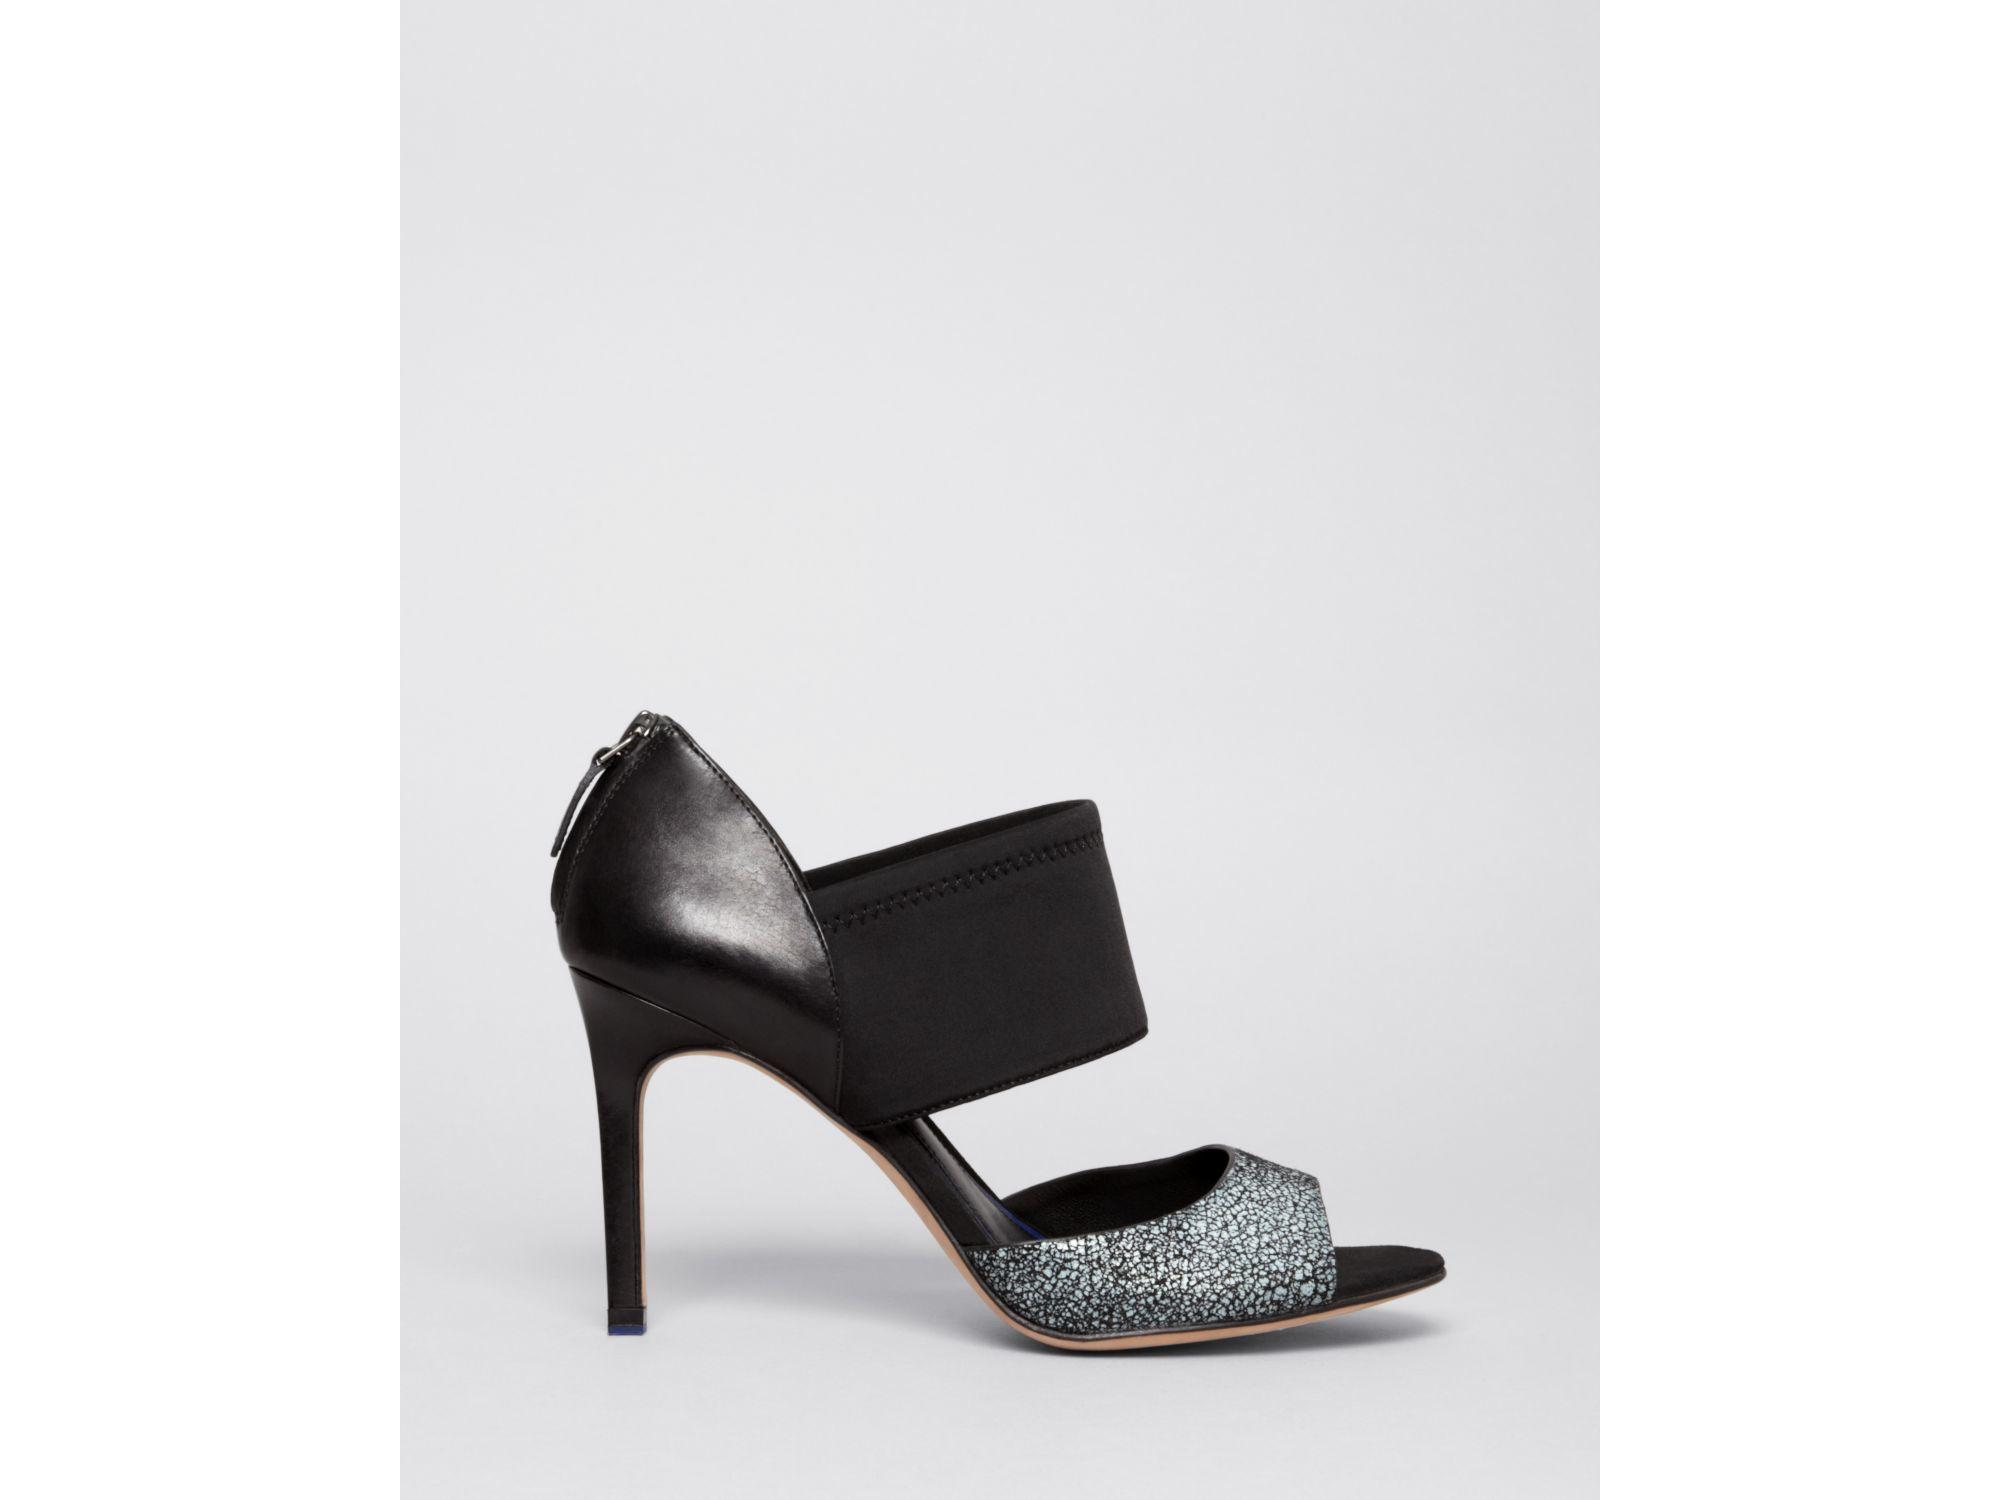 e5c9e538603 Lyst - Elie Tahari Open Toe Platform Pumps - Indra High Heel in Black